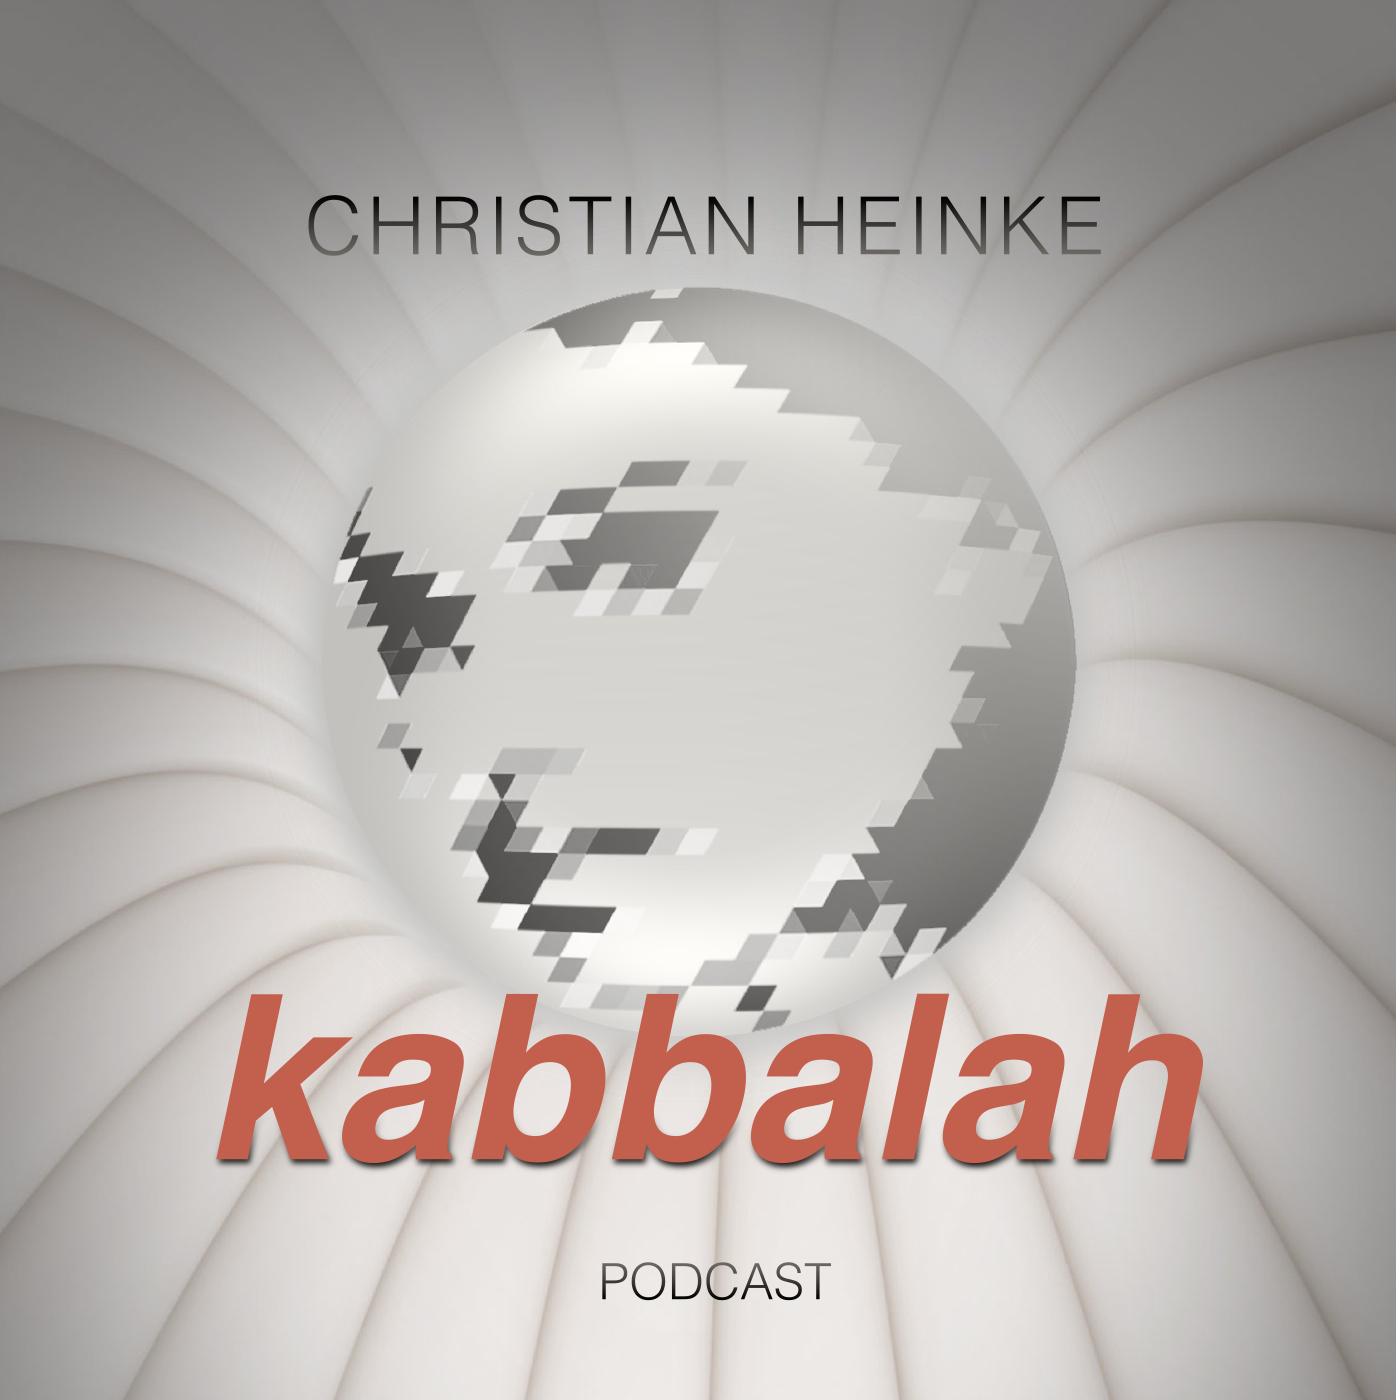 Kabbalah (Audiobook) - heinkedigital.com